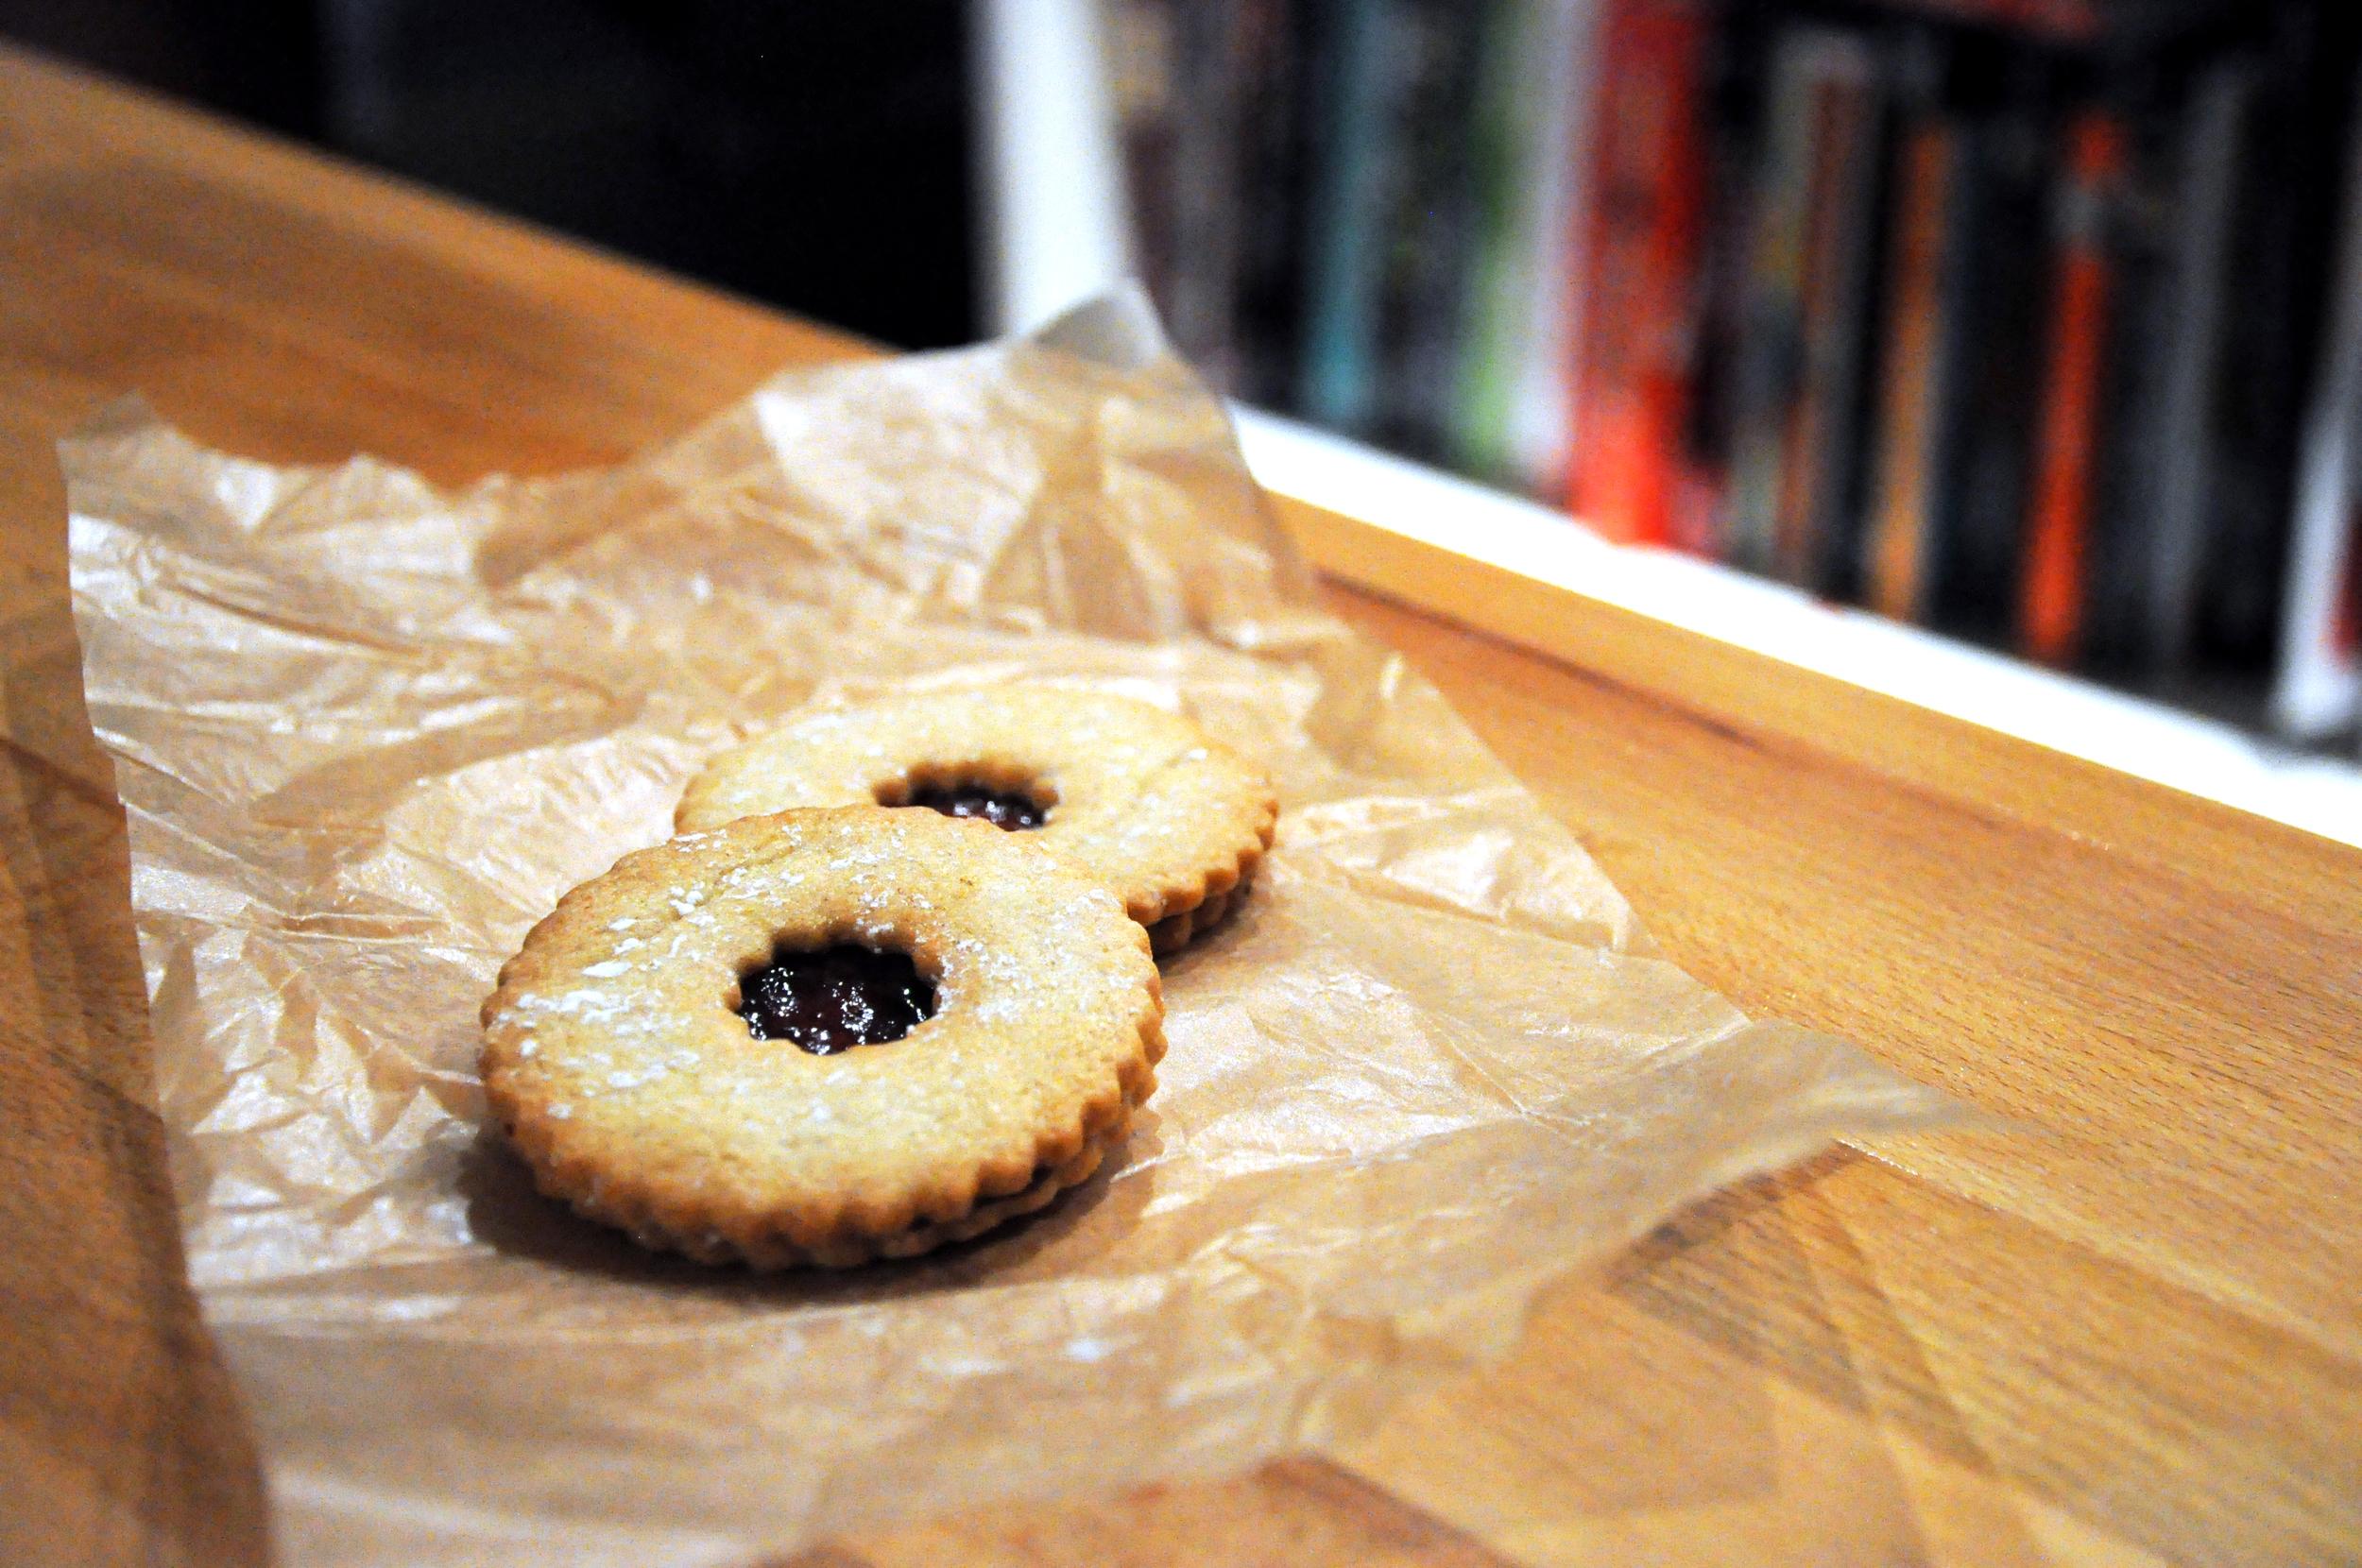 Linzer cookies at Dujour Bakery